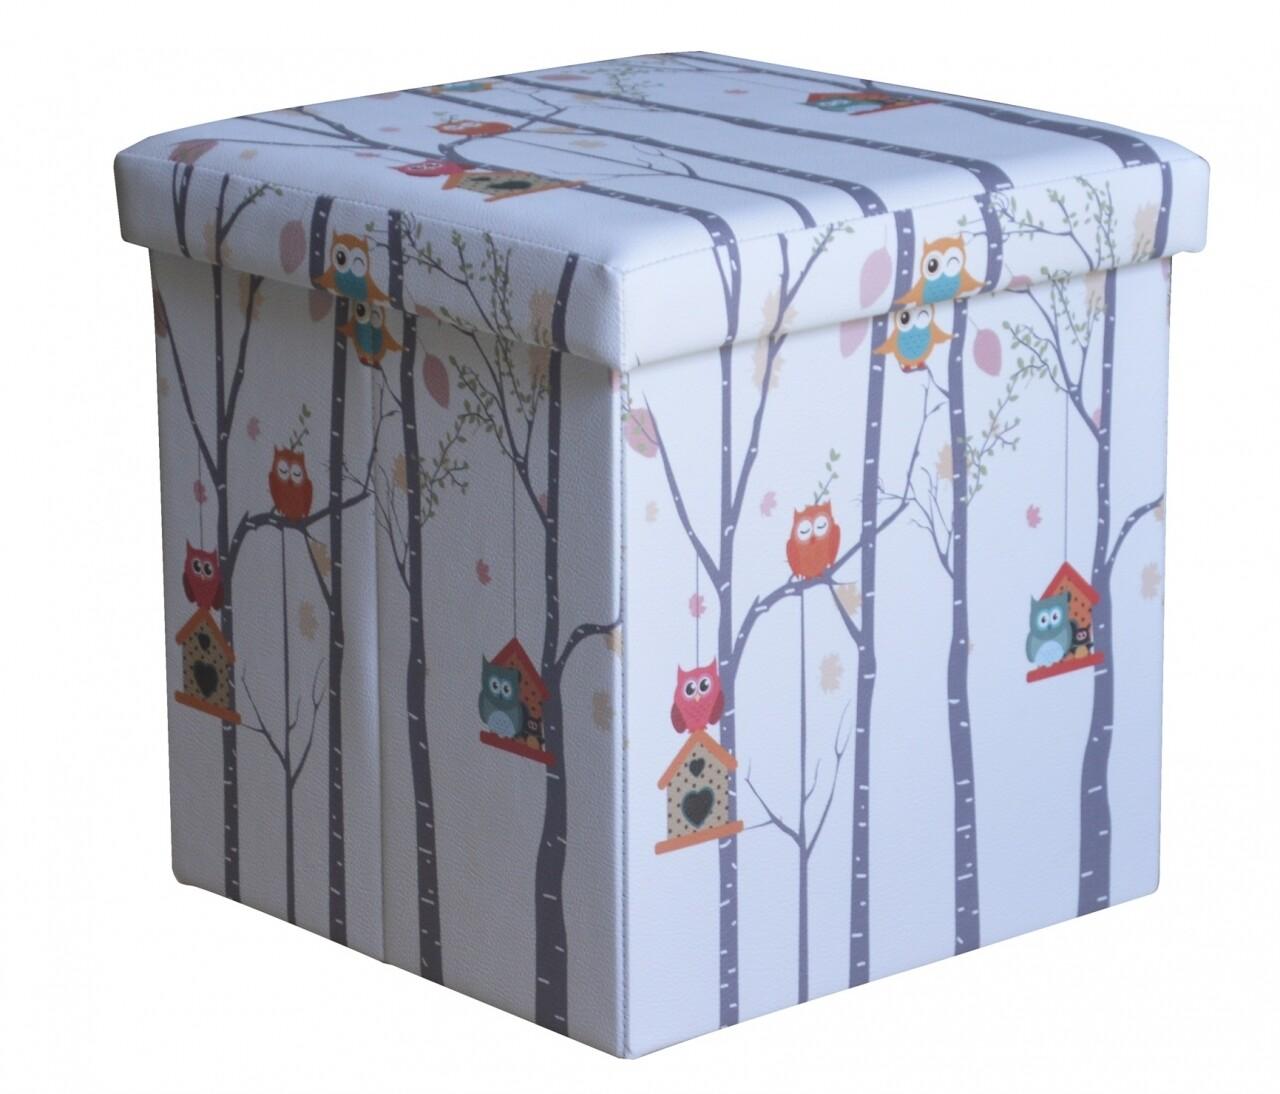 Taburet pliabil cu spatiu de depozitare Small Owls, Heinner Home, 37.5 x 38 x 38 cm, PVC, multicolor